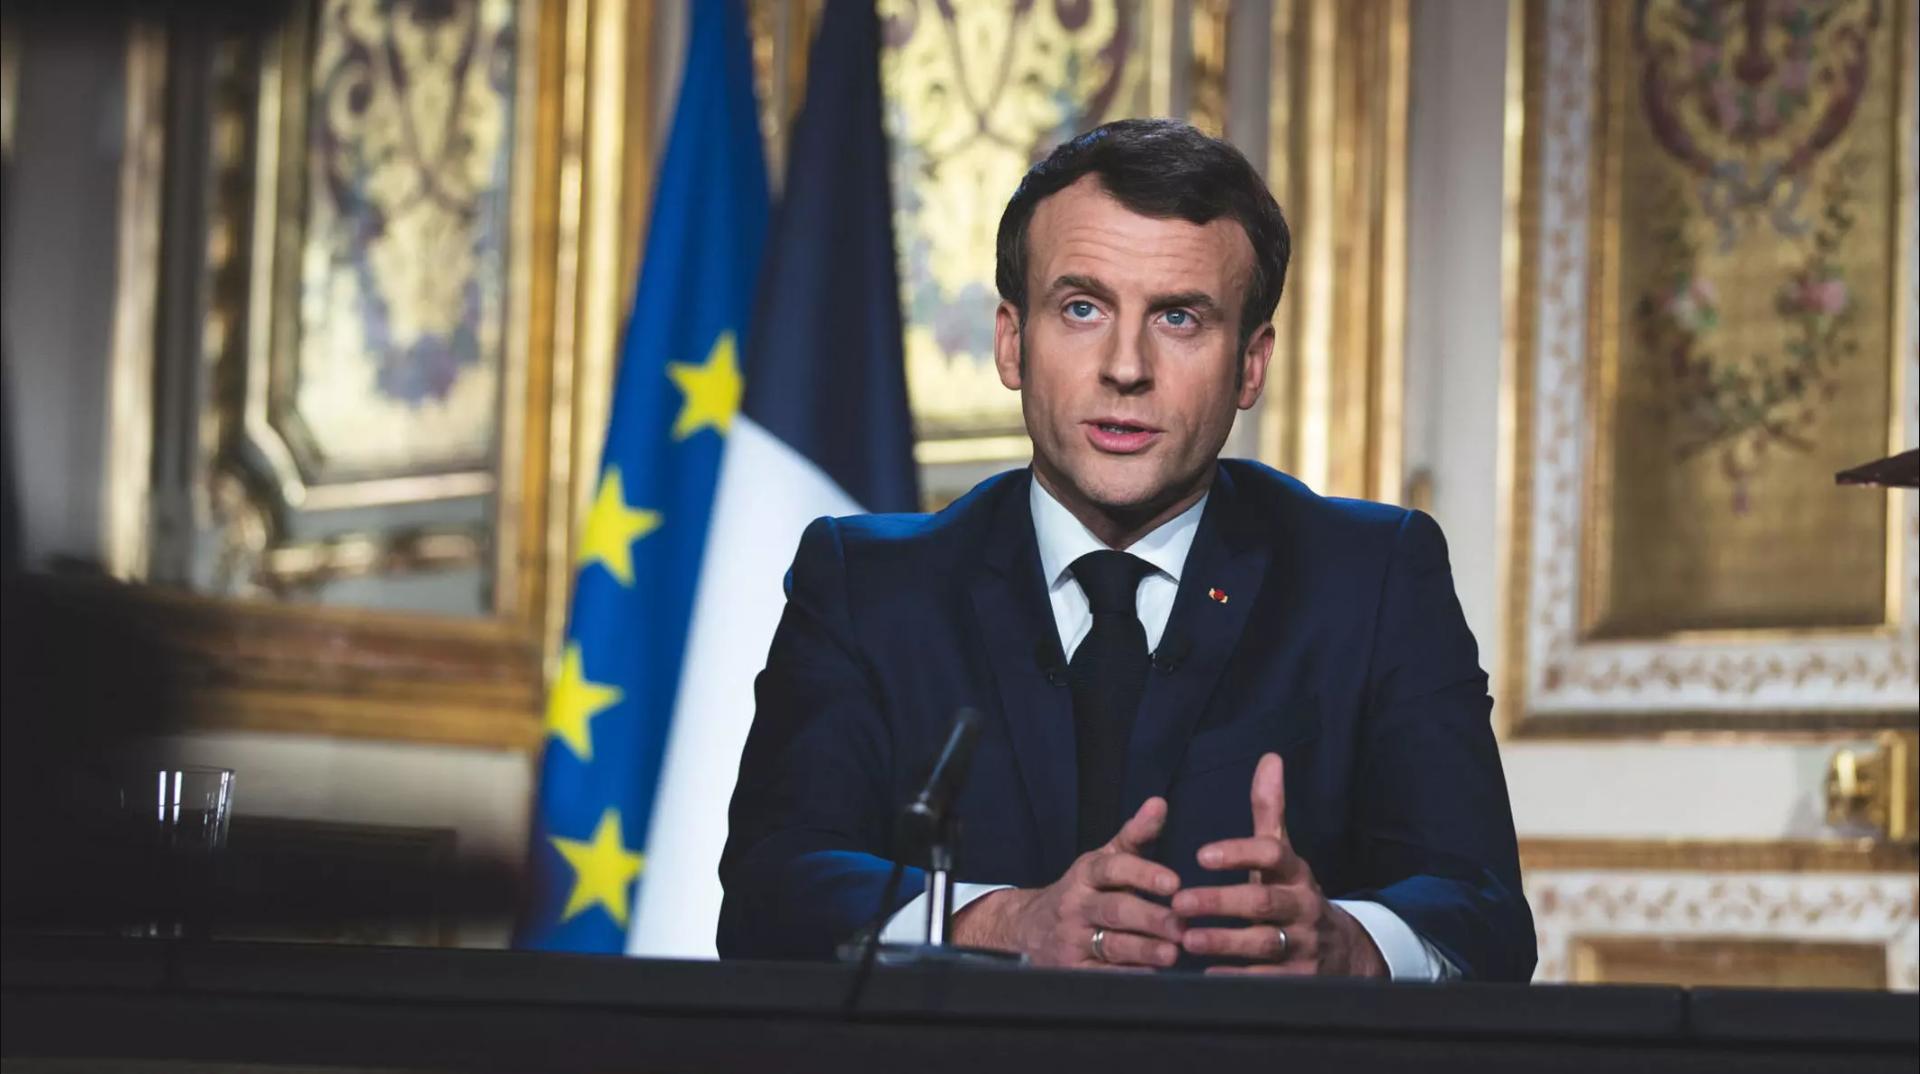 2020-04-15 france president emmanuel macron elysee palace